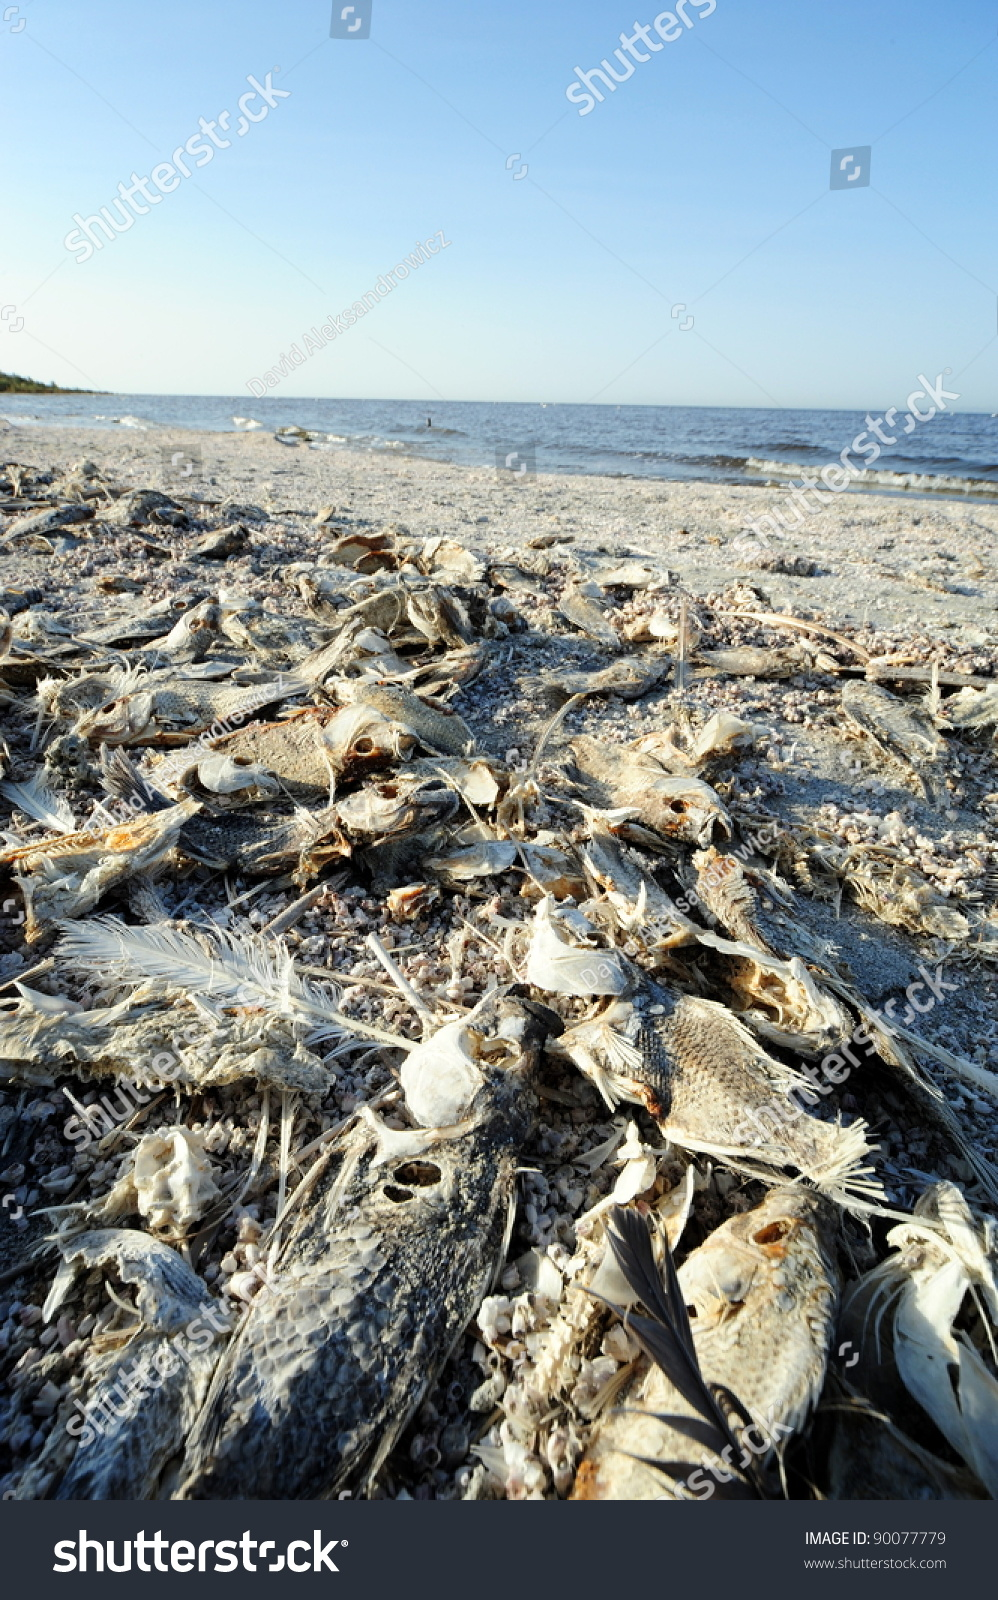 Dead fish at salton sea stock photo 90077779 shutterstock for Salton sea fishing